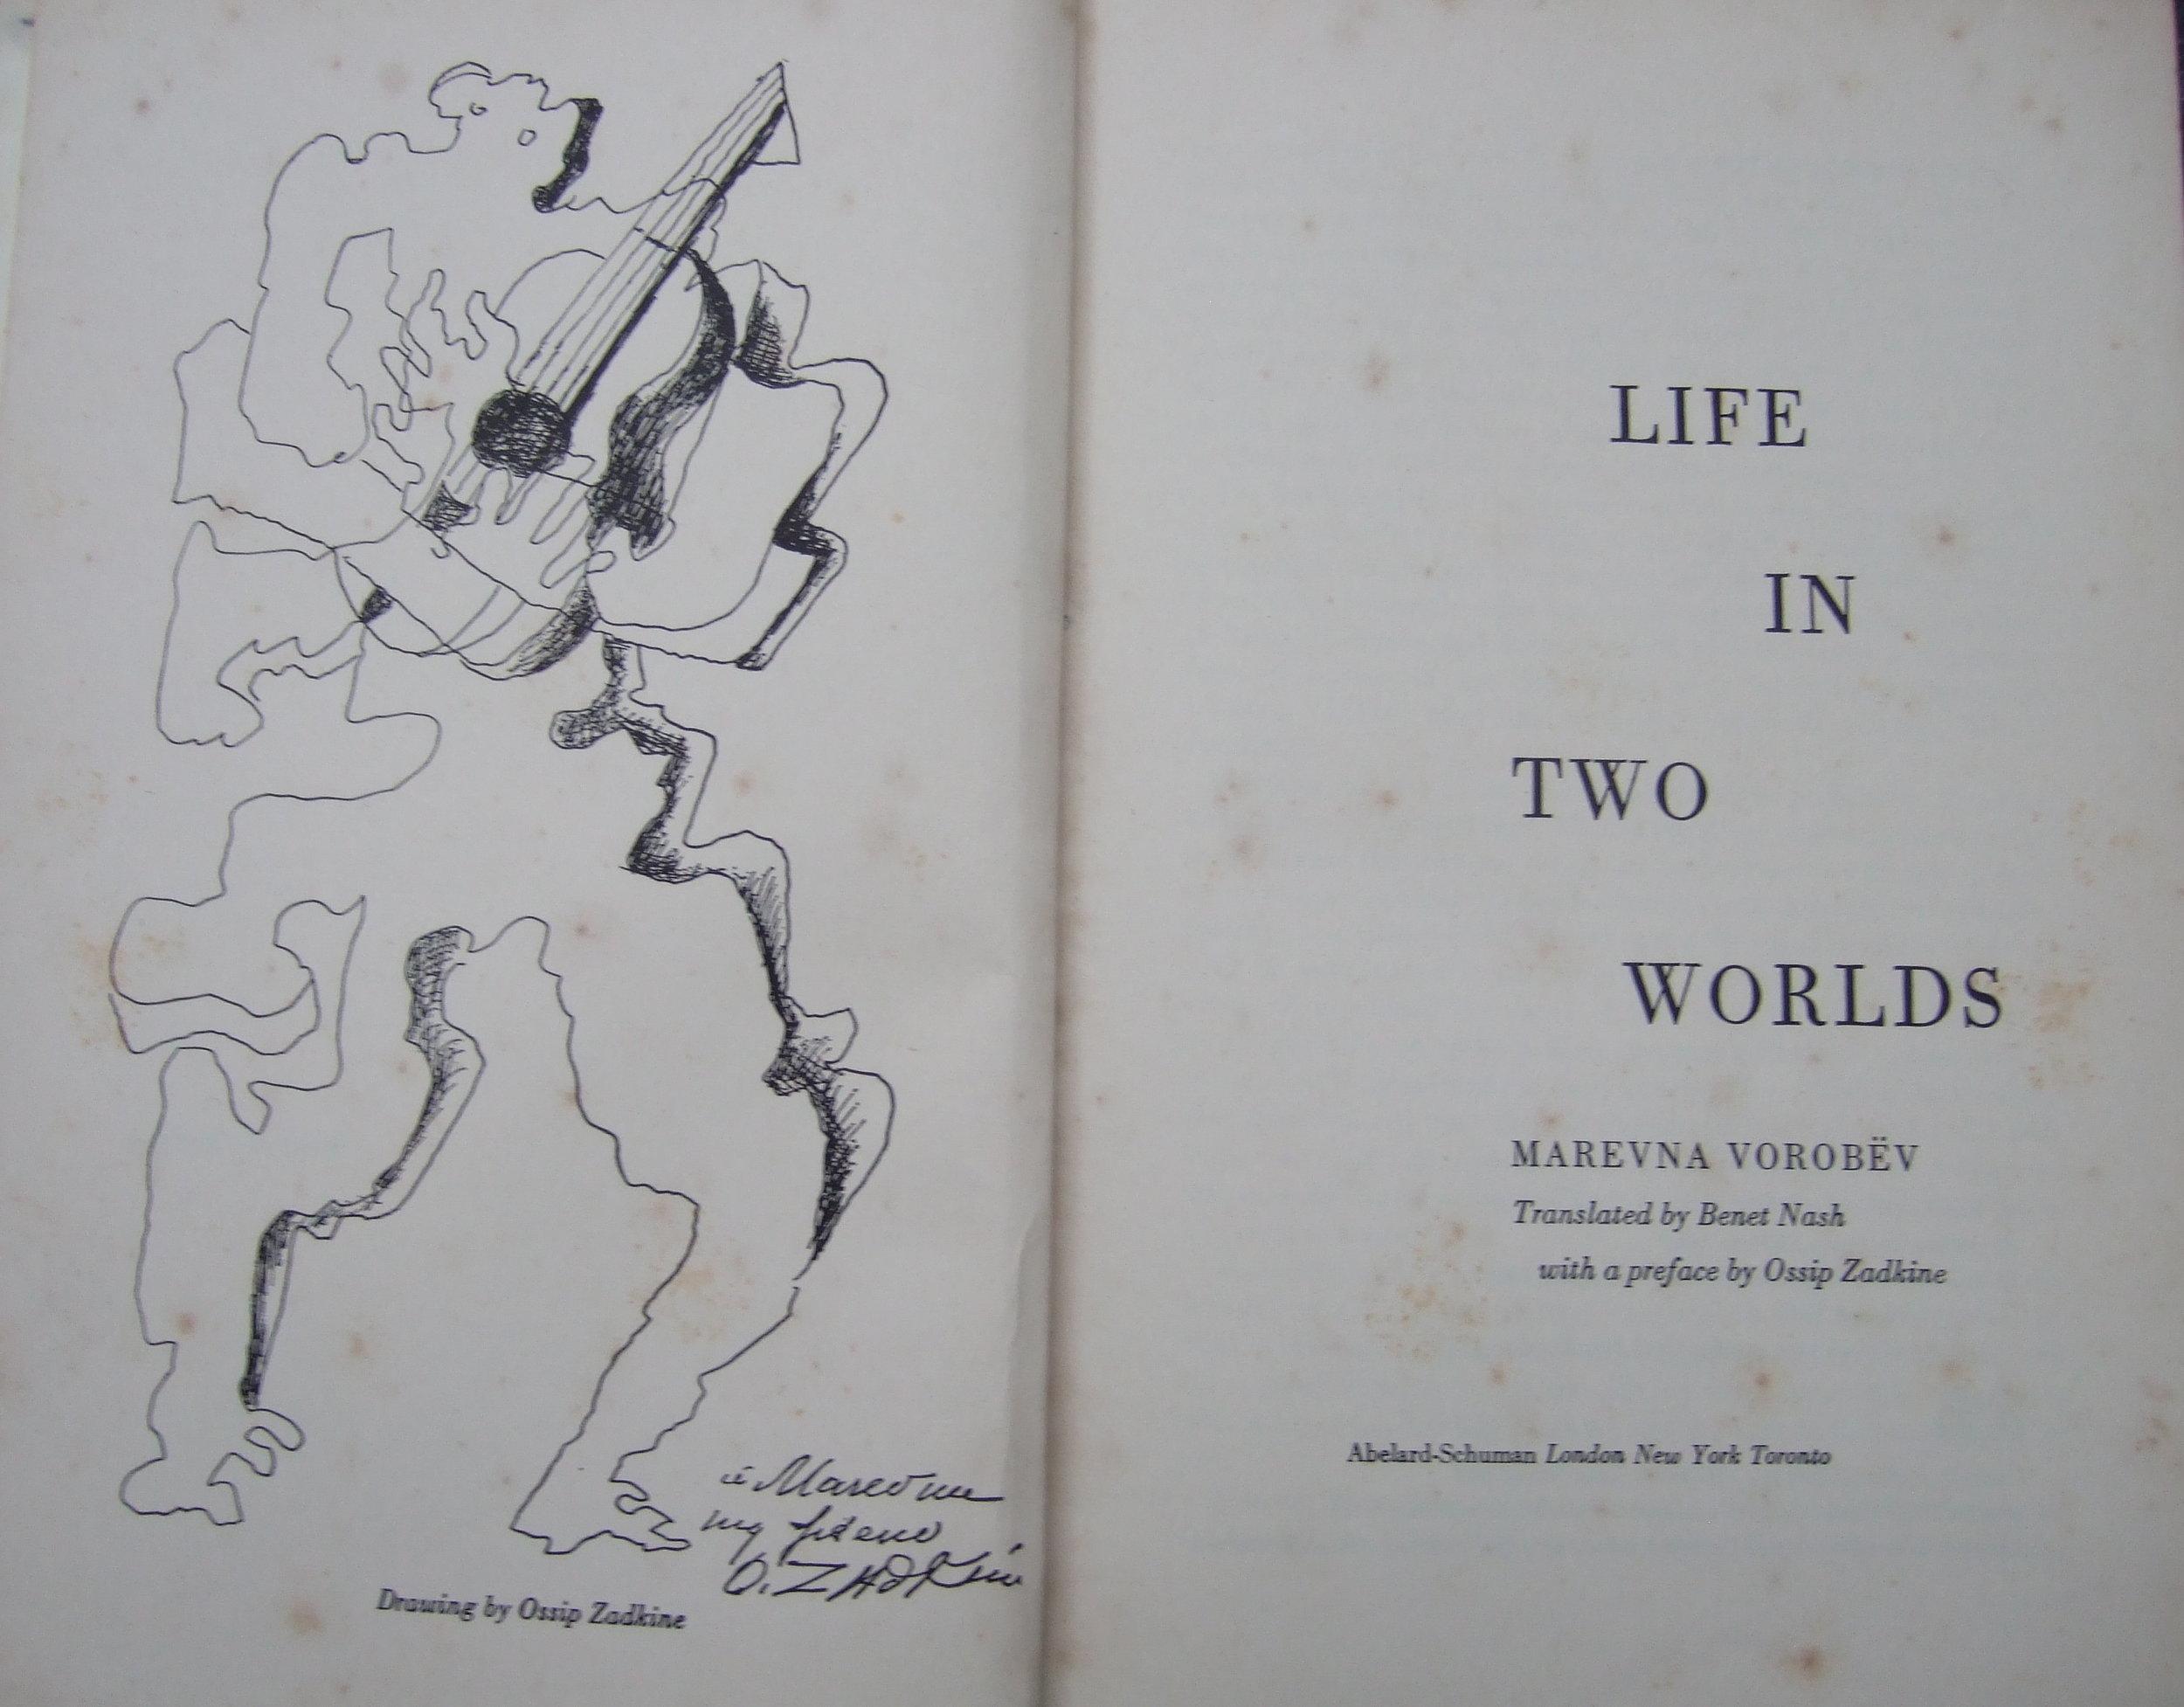 """Life in Two Worlds"" by Marevna Vorobev"